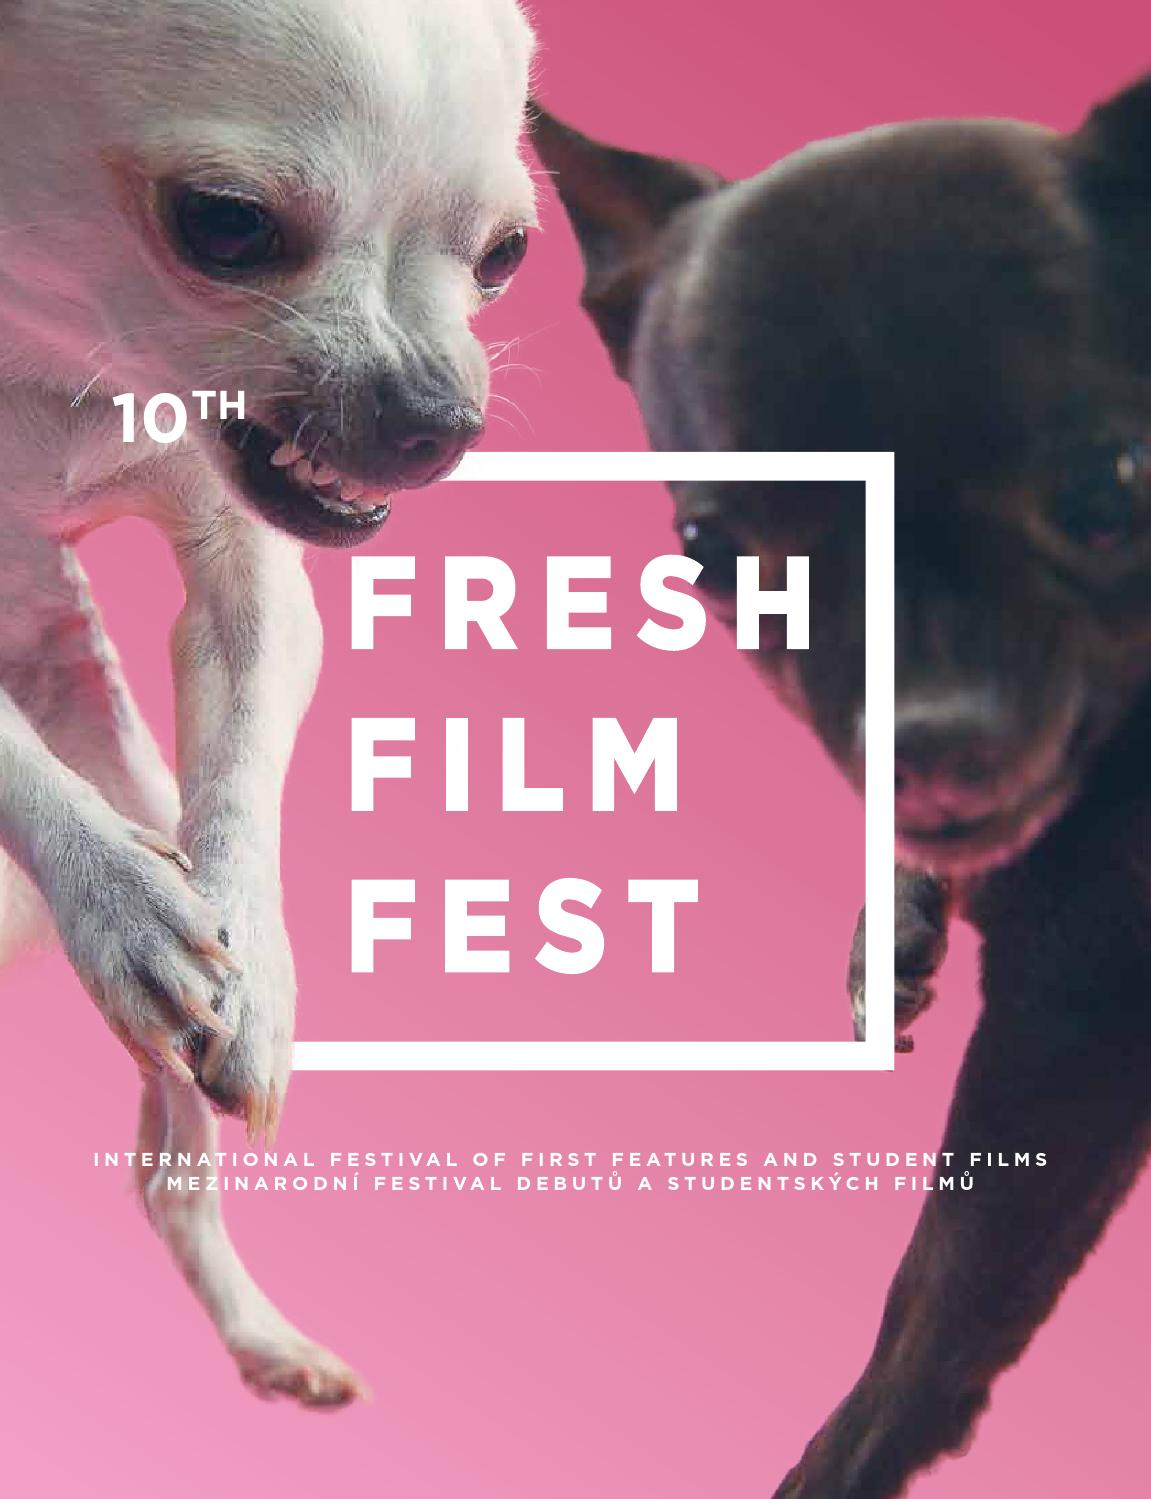 10th Fresh Film Fest Catalogue